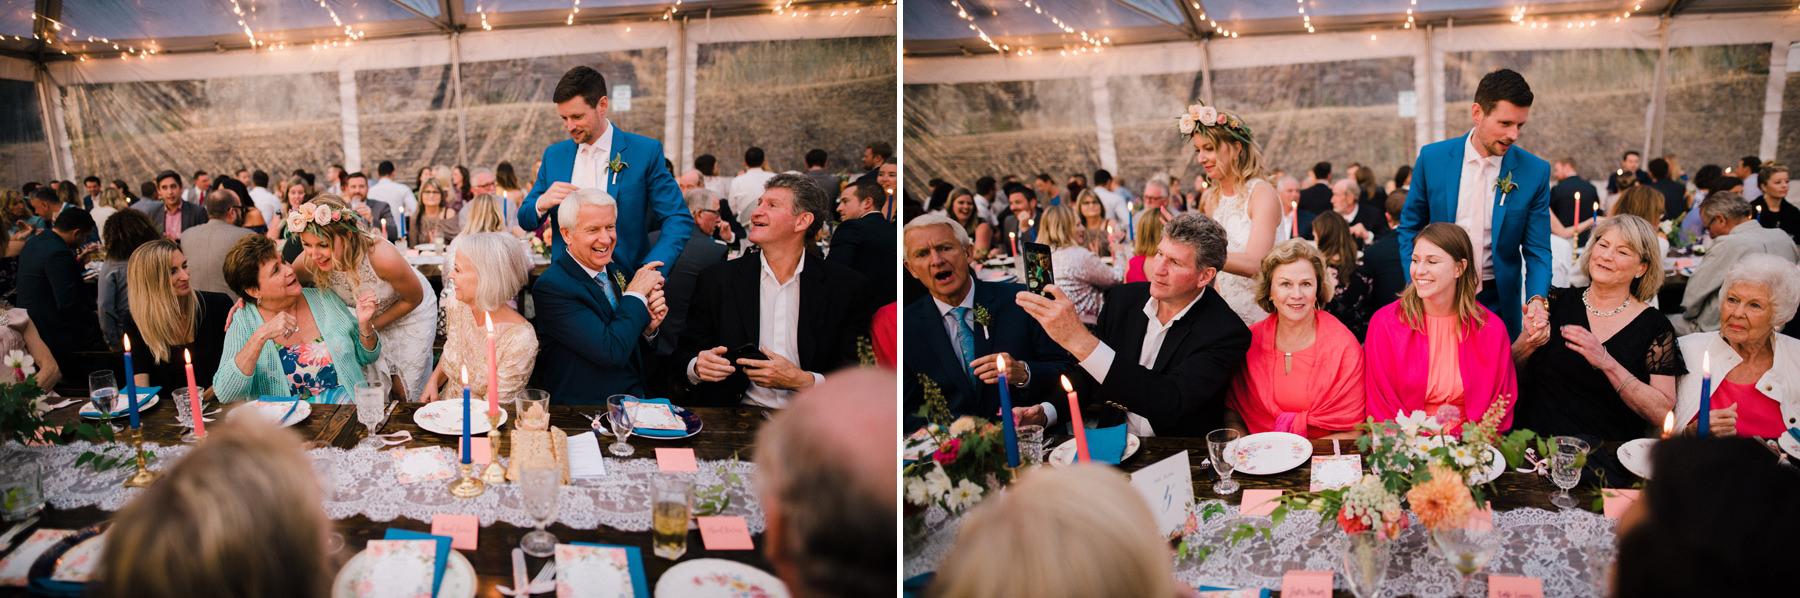 370-colorful-outdoor-lopez-island-wedding.jpg